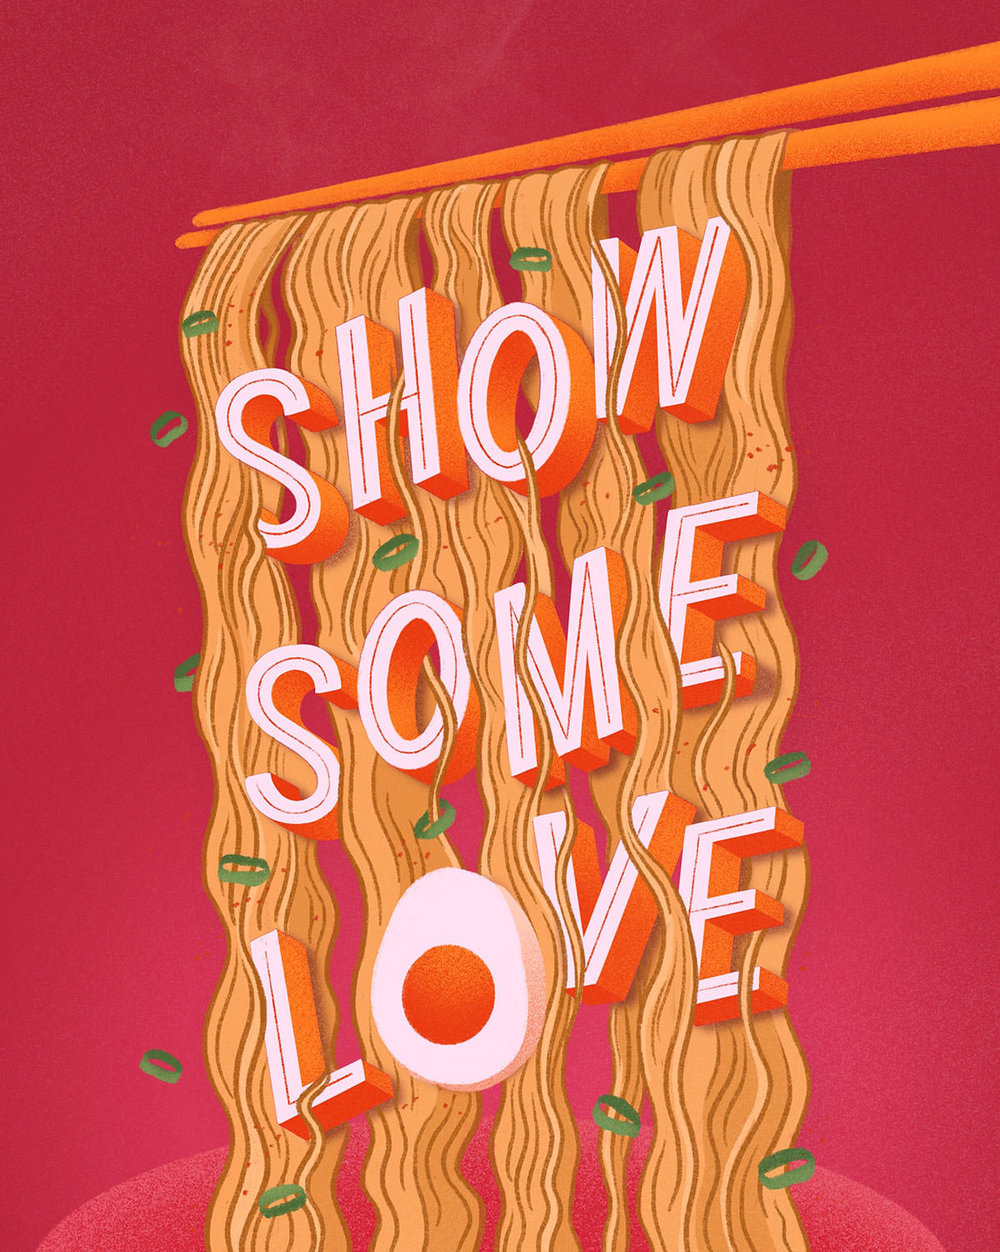 show-some-love-noodles